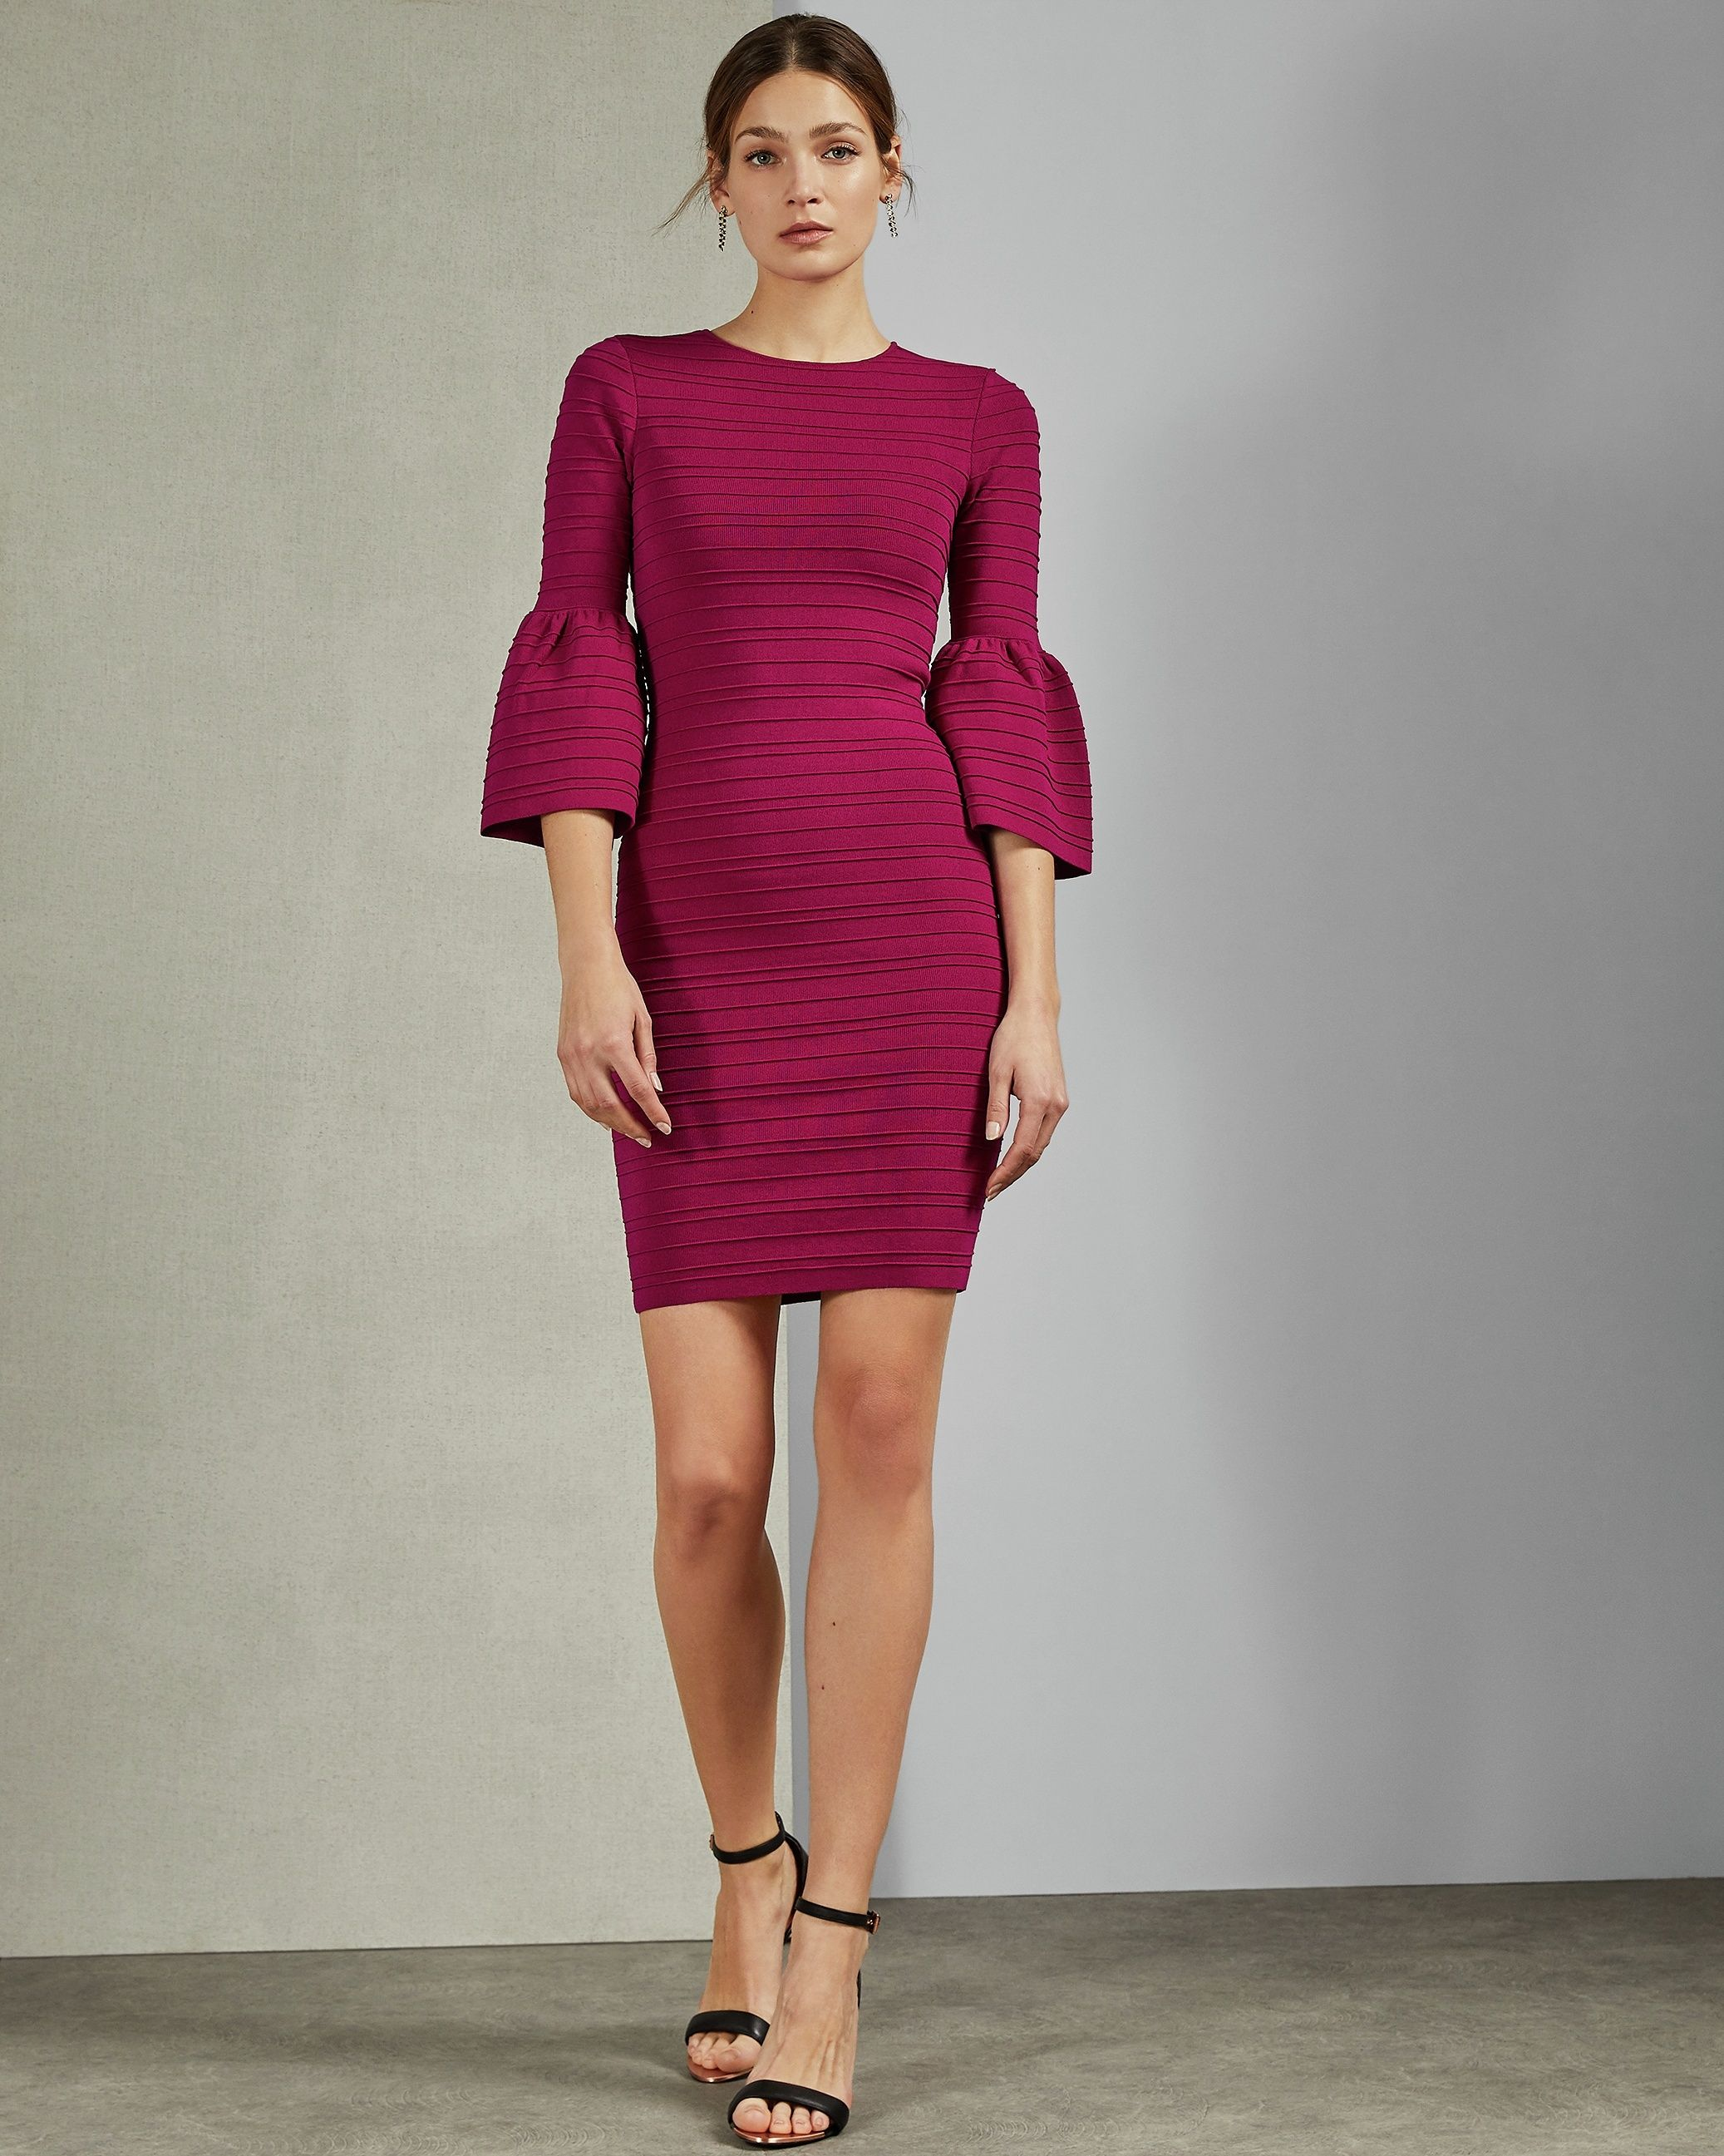 Ted Baker Yansiaa Bell Sleeve Bodycon Dress in Deep Pink